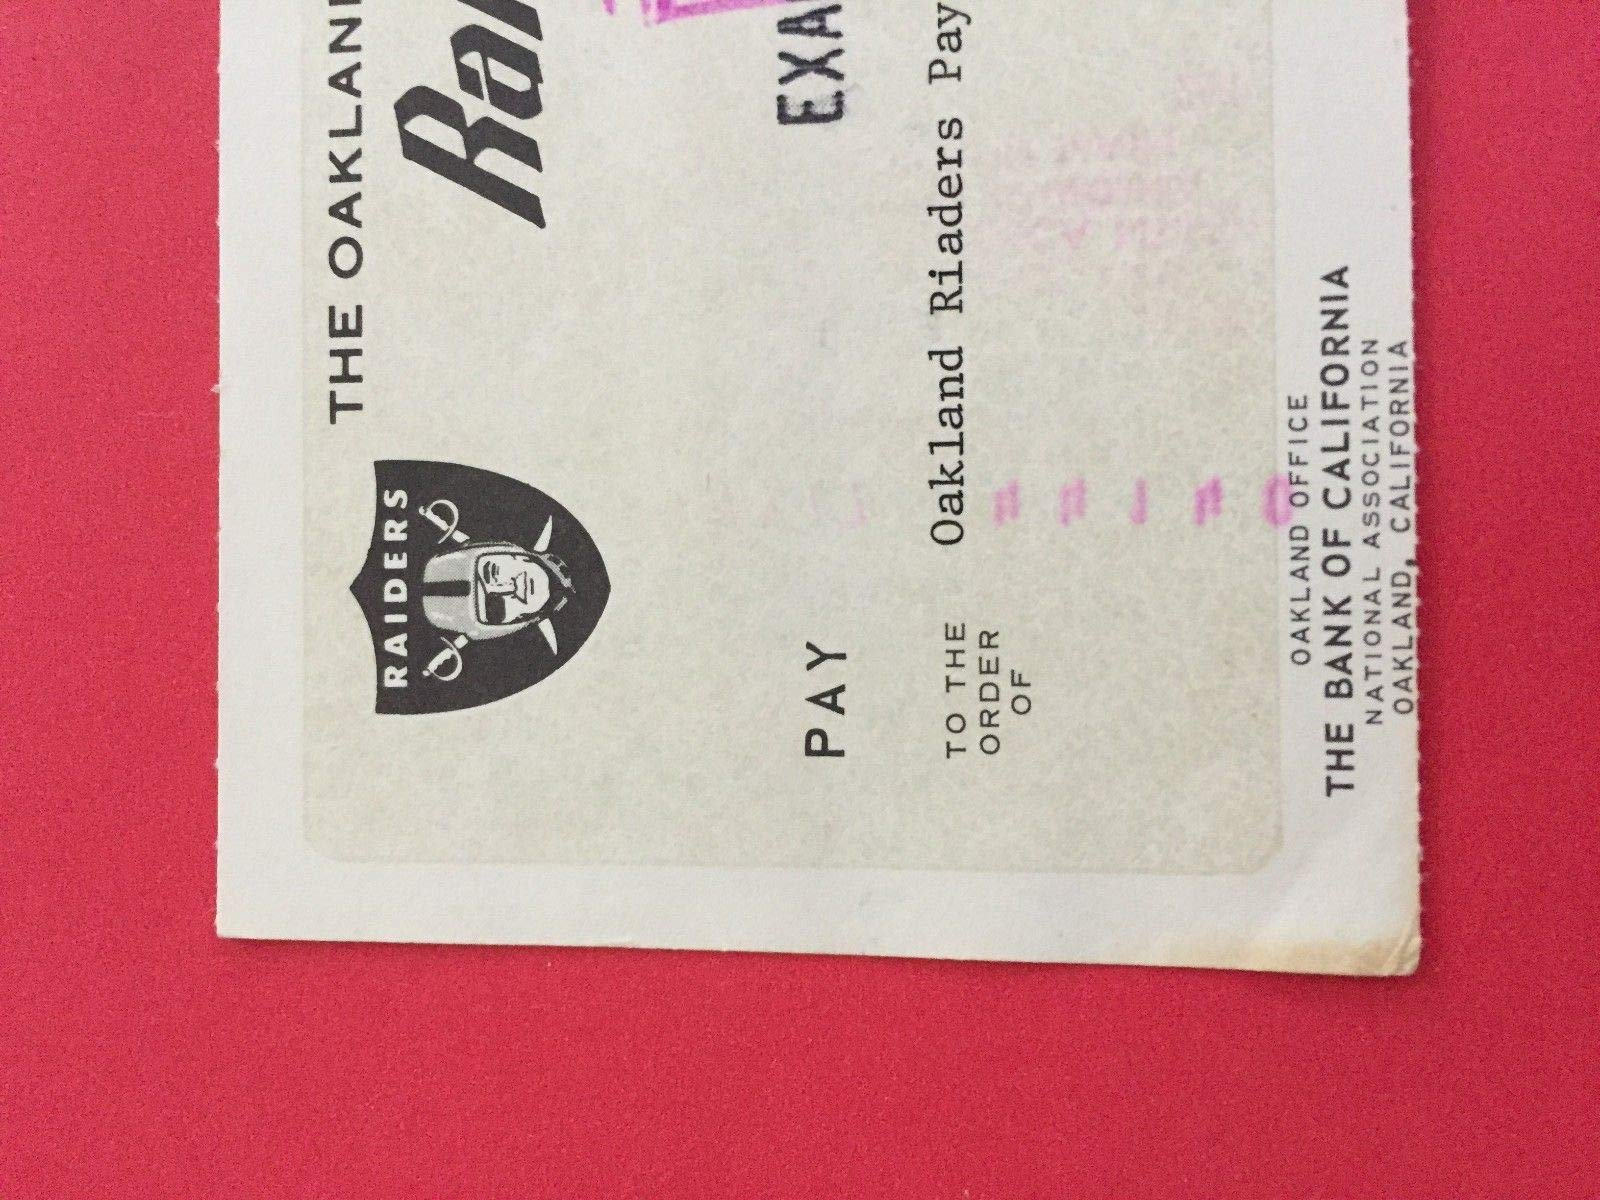 Al Davis Raiders Hof Check Autographed Signed JSA Authentic Memorabilia Certified Letter Loa